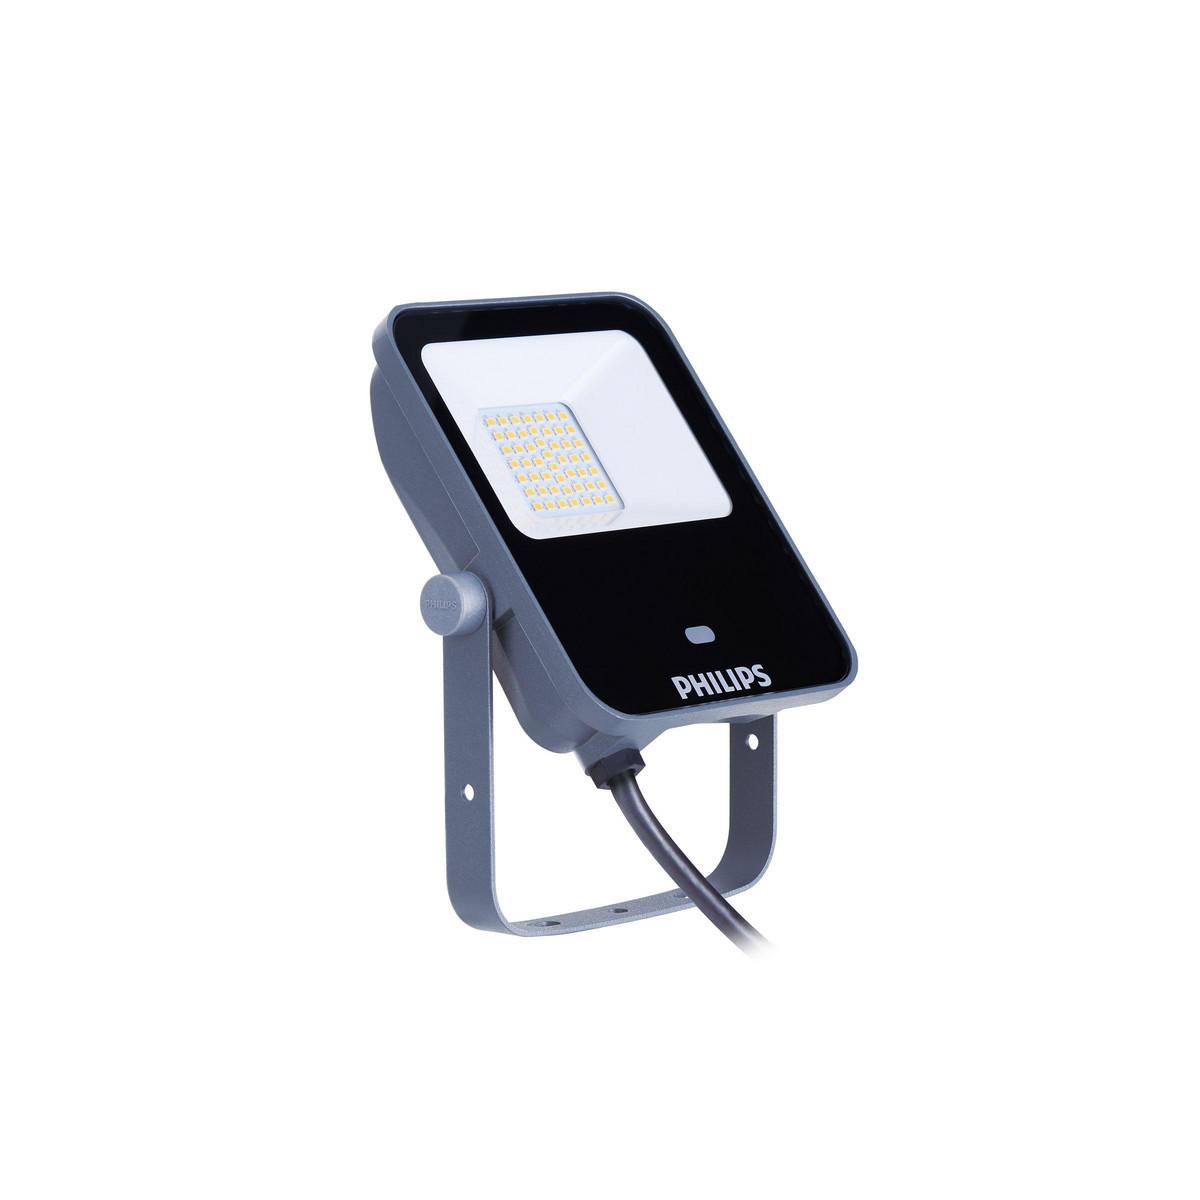 Ledinaire Projektør Gen2 Lille BVP154 LED 1000lm/830 10W Meget bredstrålende (VWB) Mikrobølgesensor